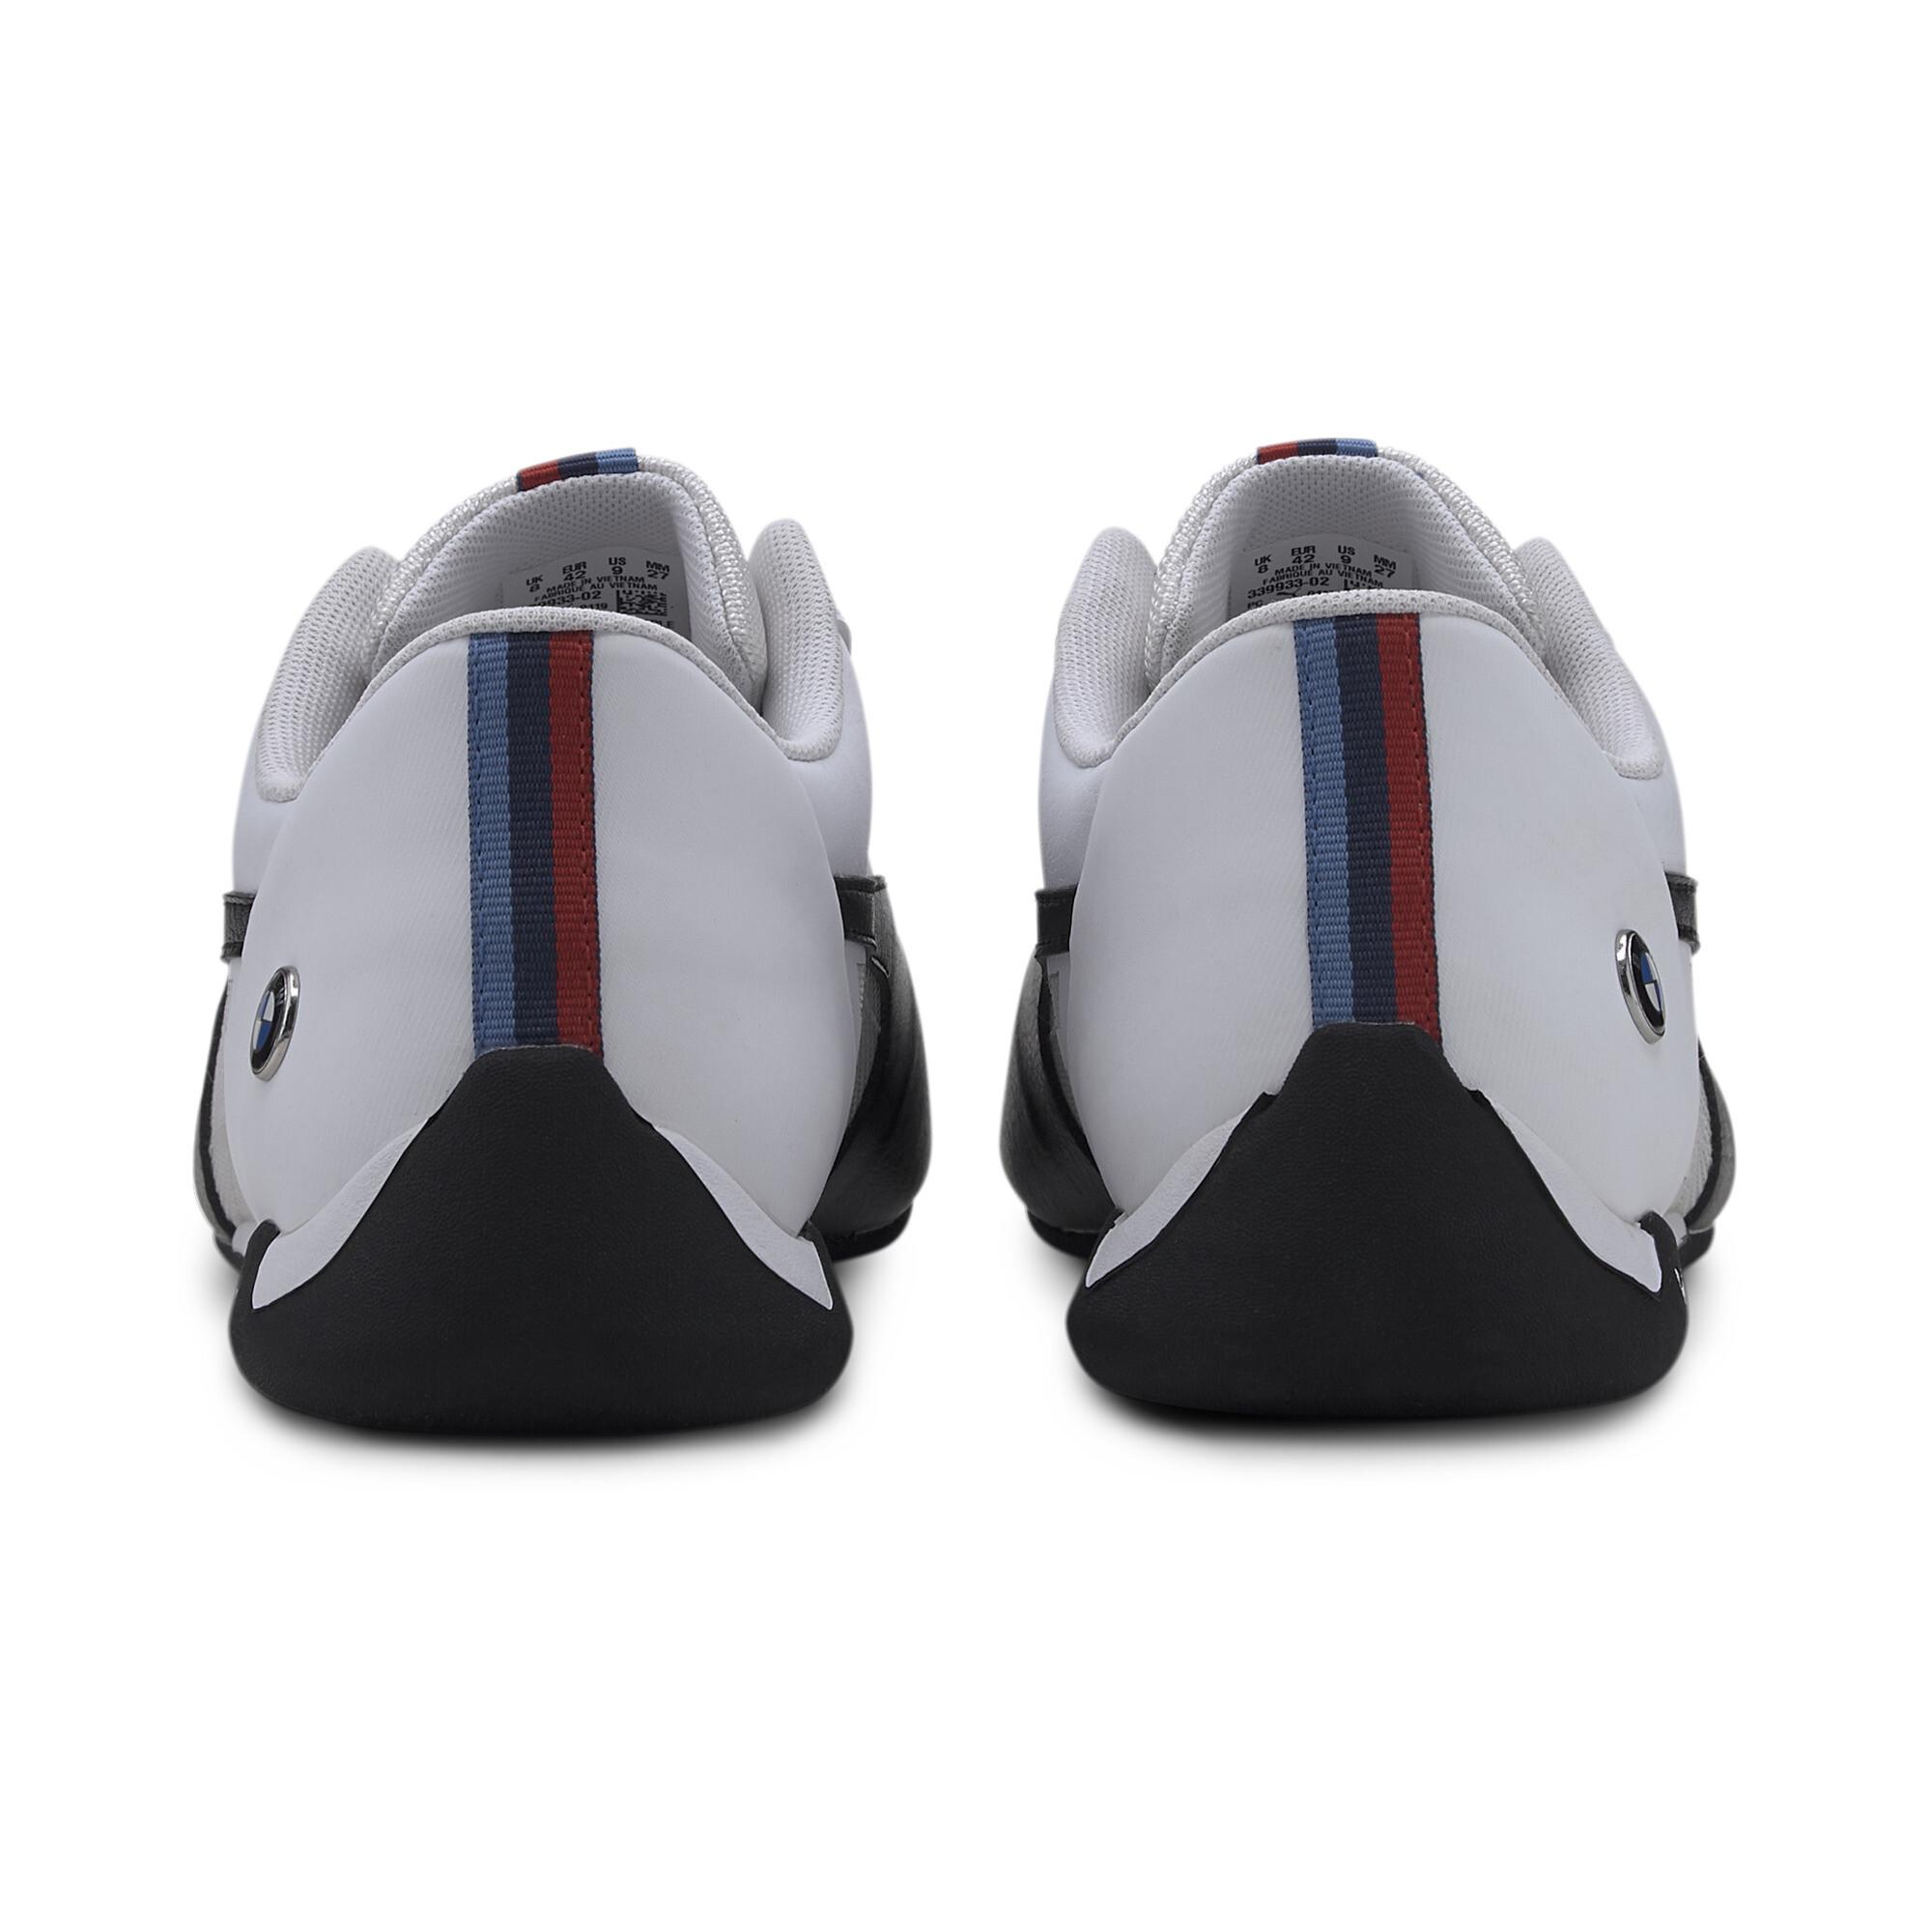 PUMA-Men-039-s-BMW-M-Motorsport-R-Cat-Motorsport-Shoes thumbnail 3